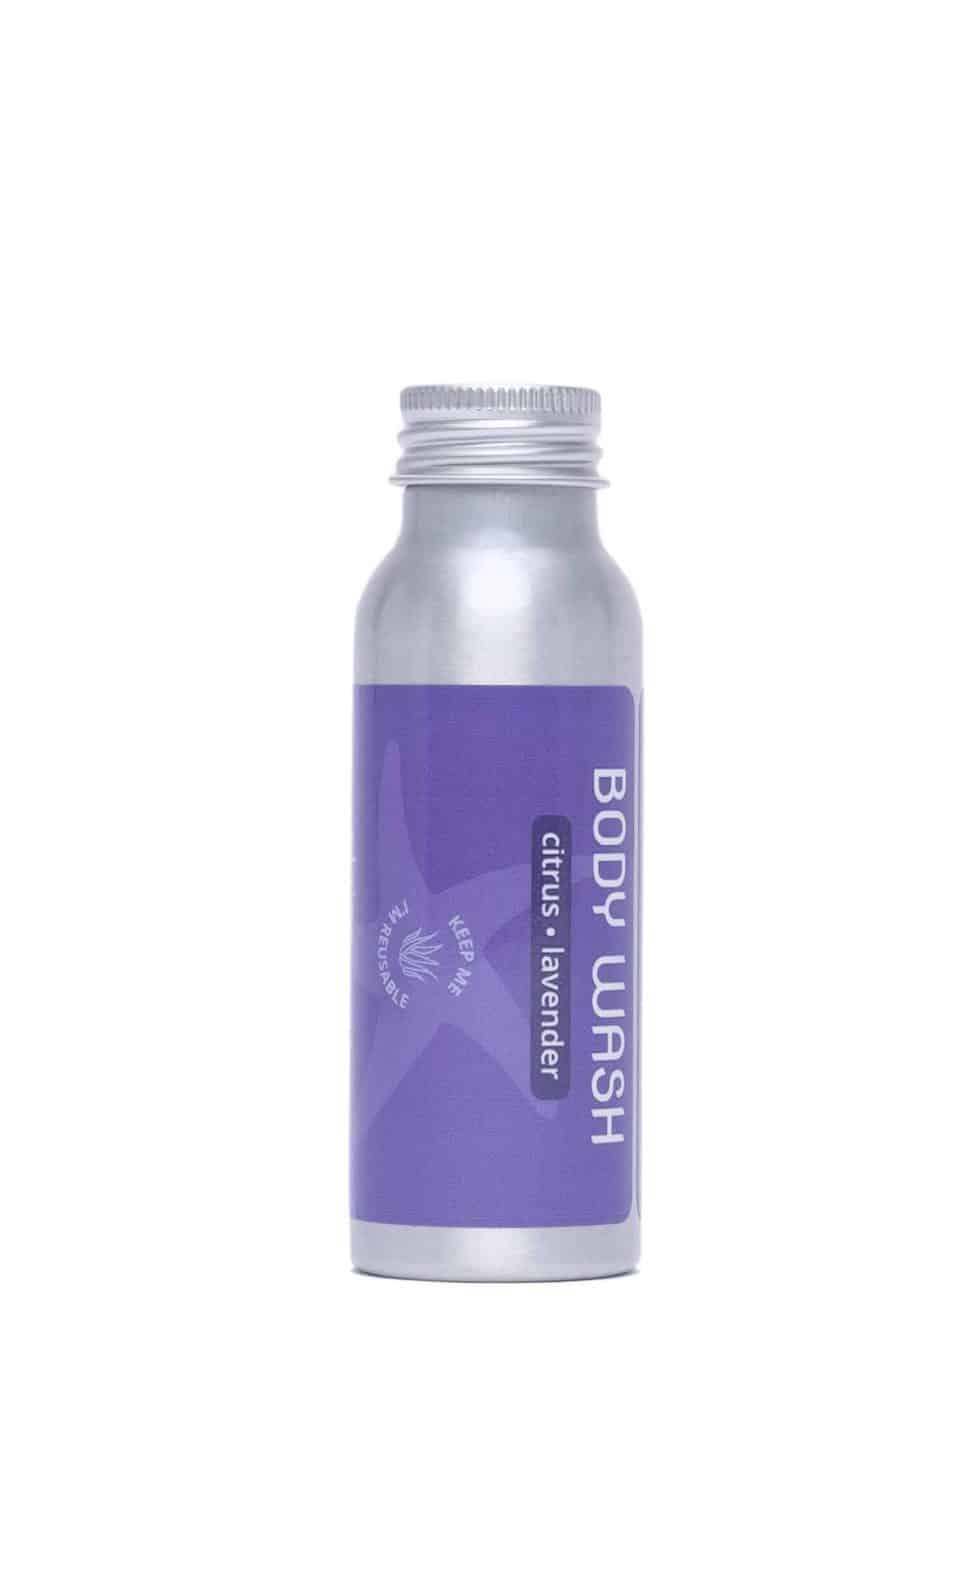 body-wash-travel-citrus-lavender